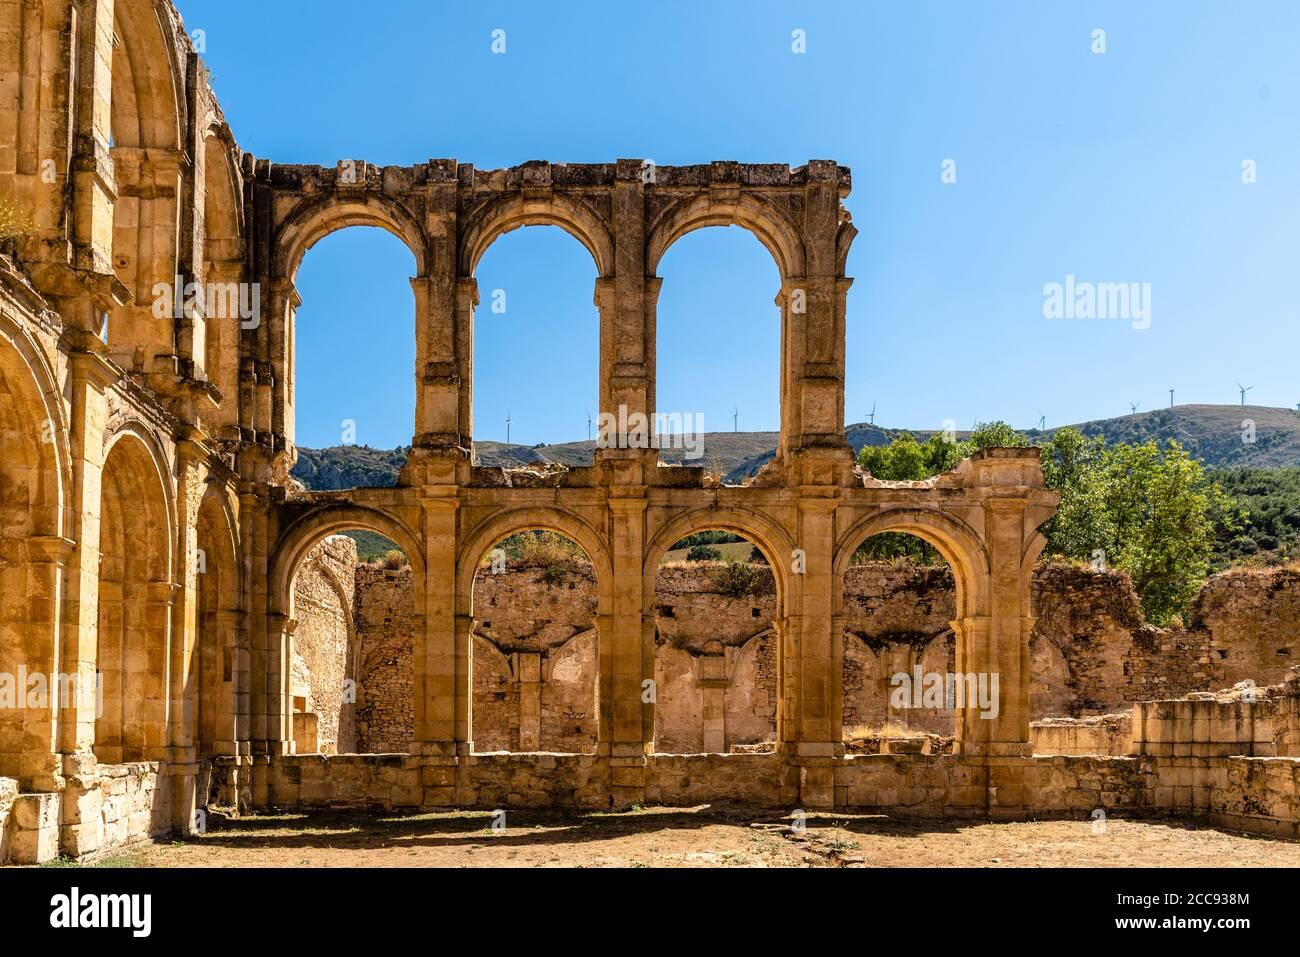 View of the ruins of an ancient abandoned monastery in Santa Maria de Rioseco, Burgos, Stock Photo